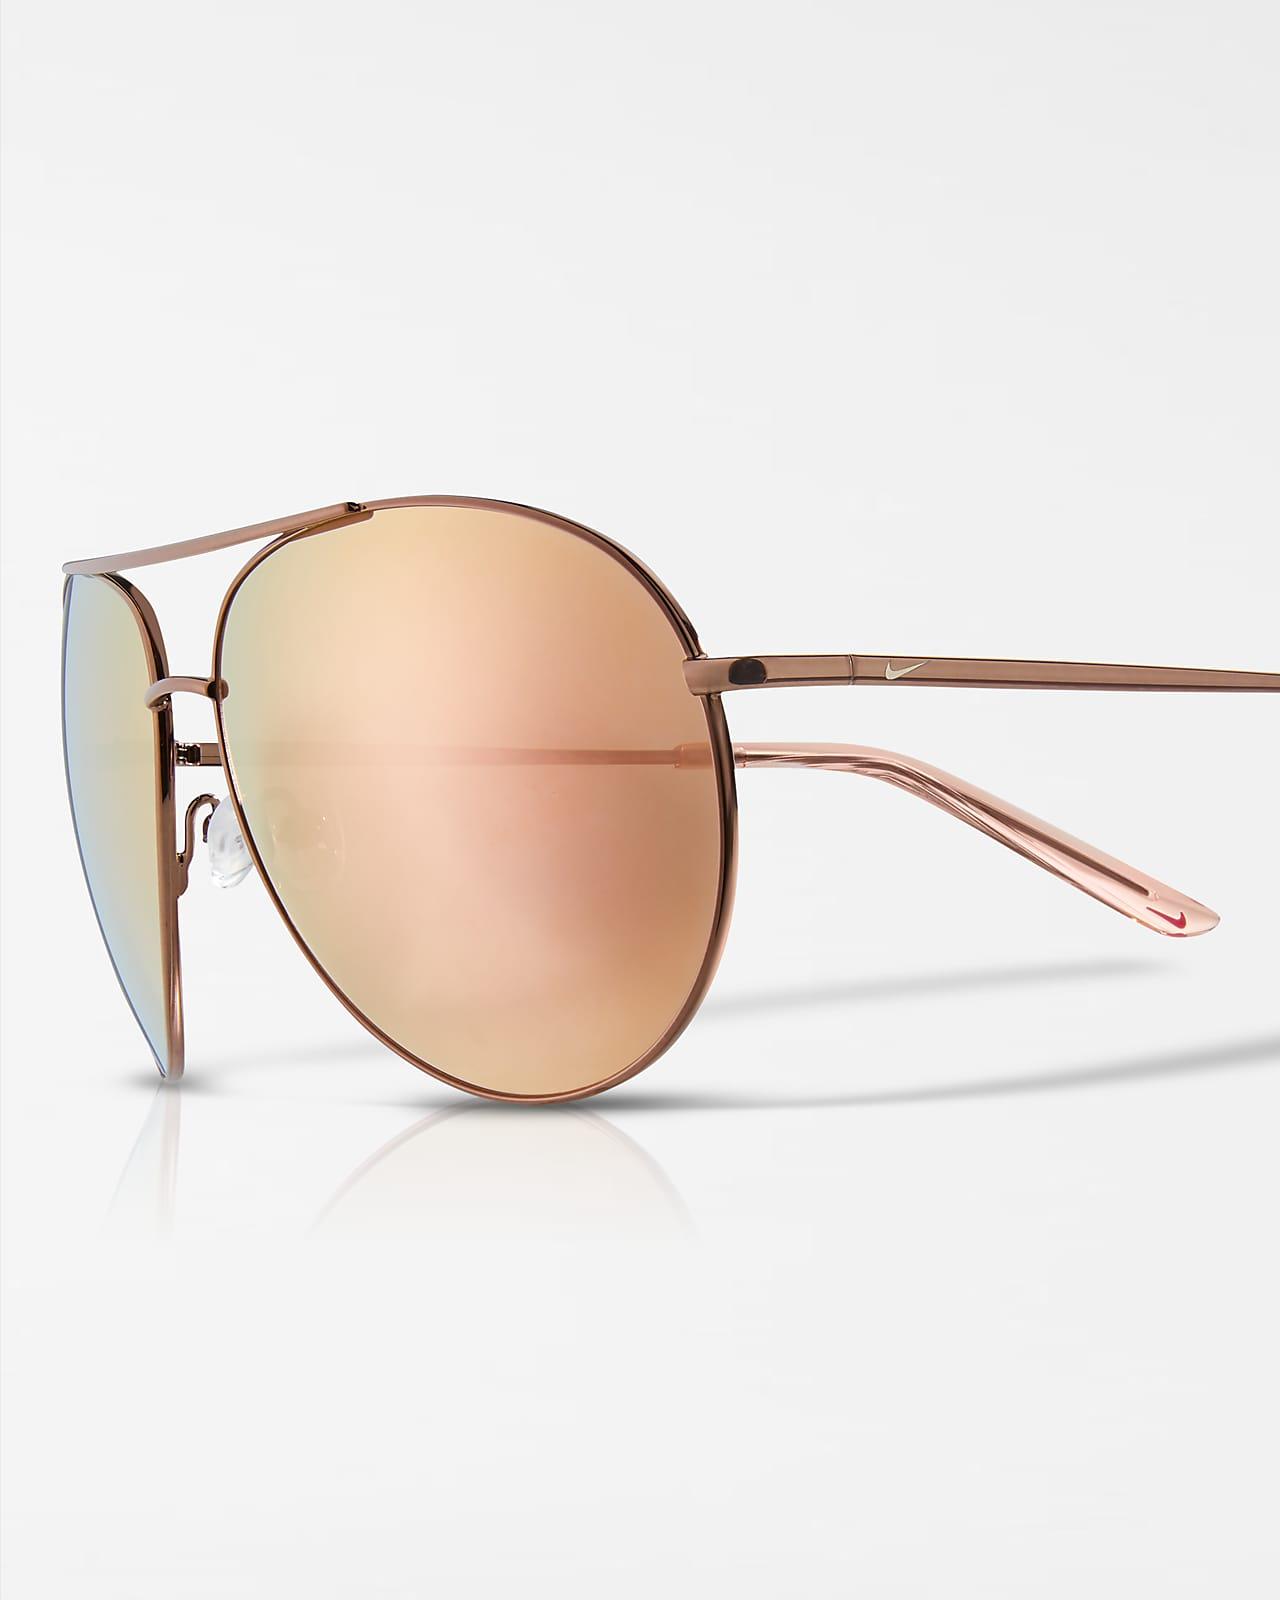 Nike Chance Sunglasses